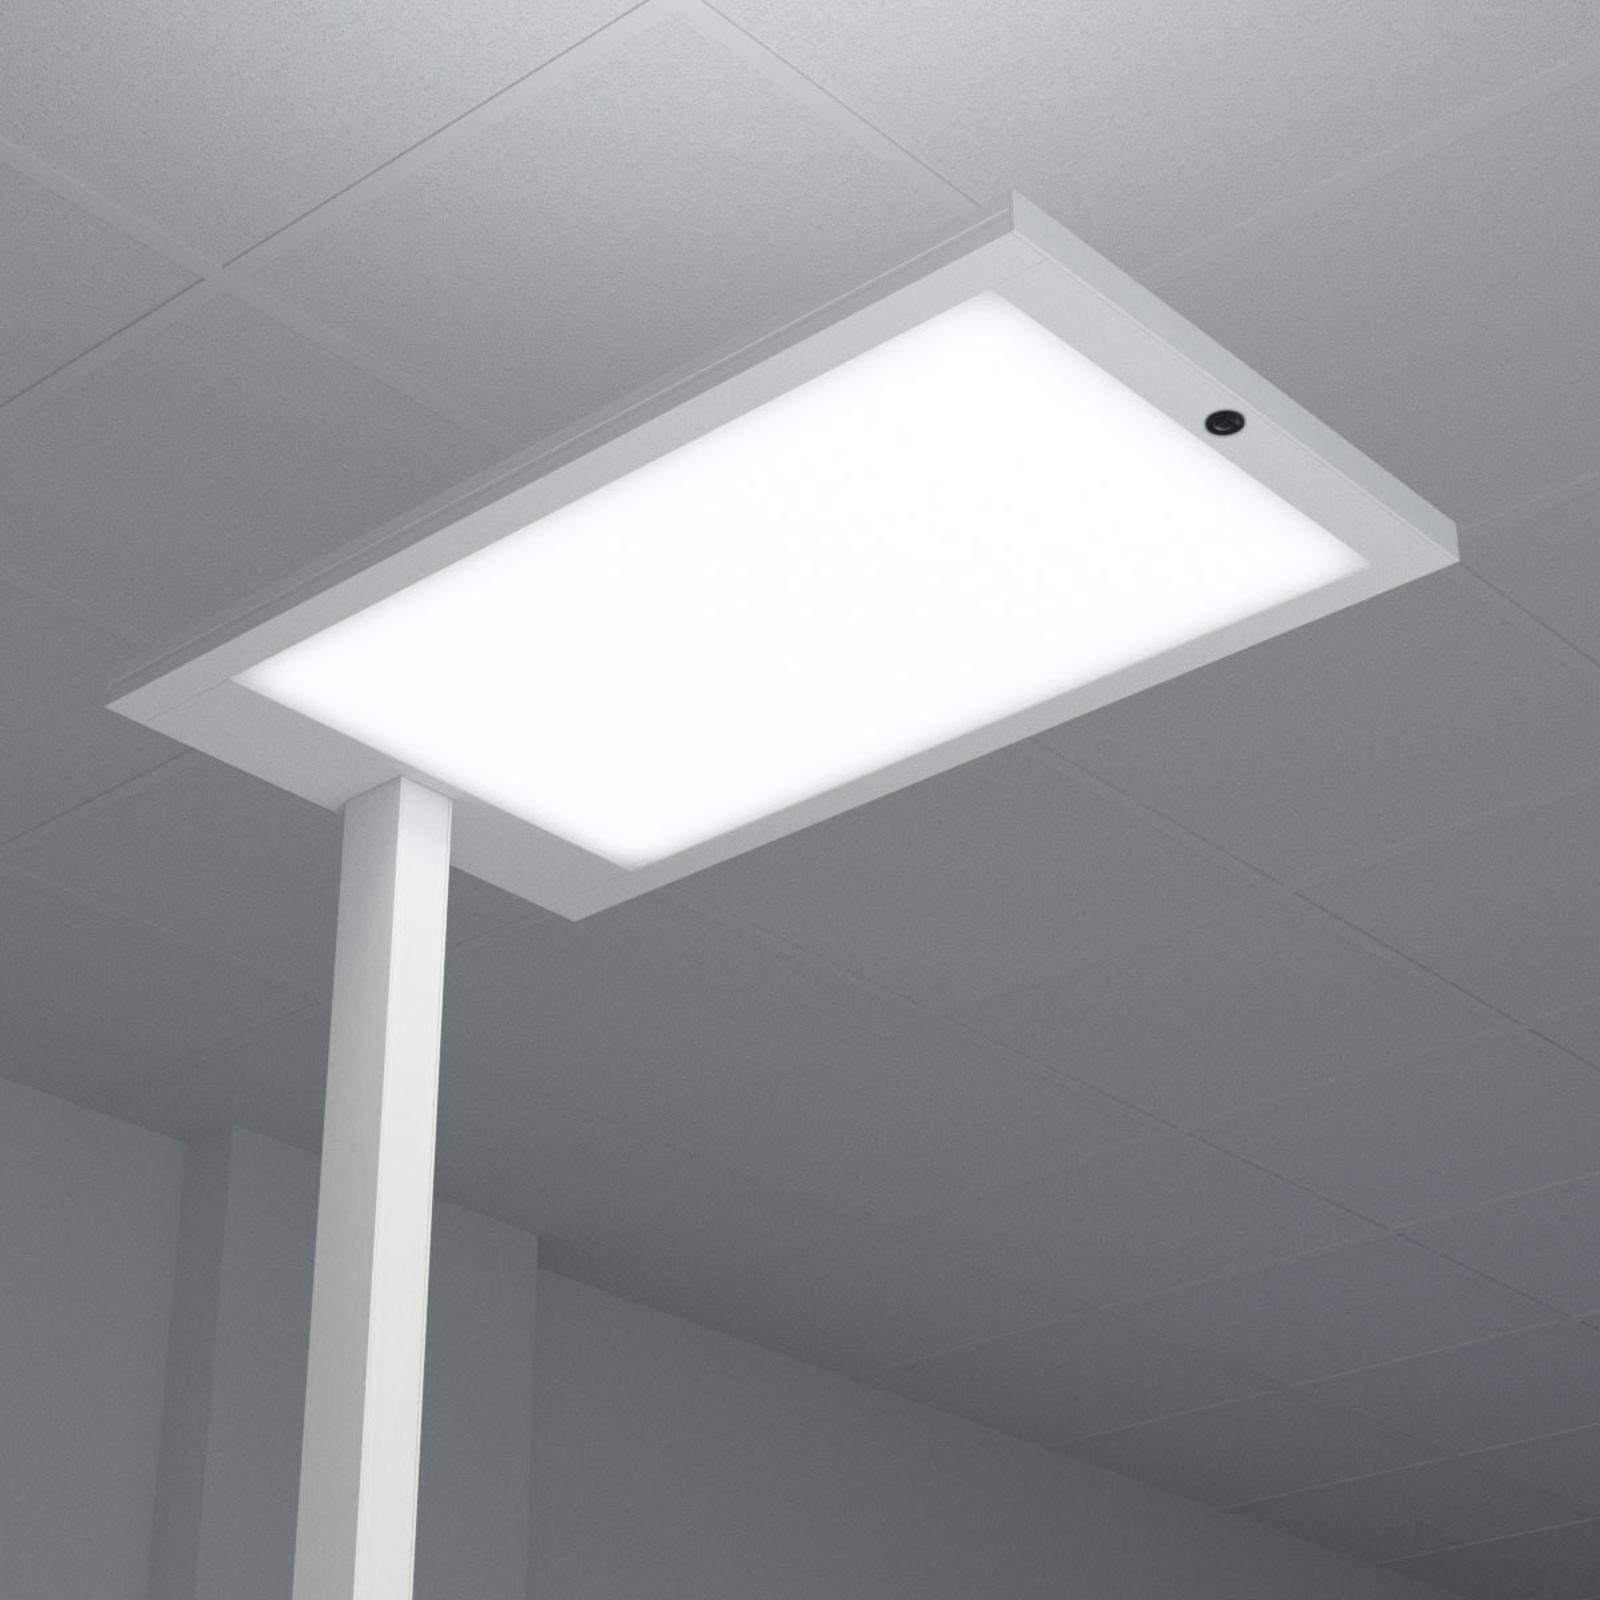 LED-Büro-Stehlampe Almira mit Dimmer, silber